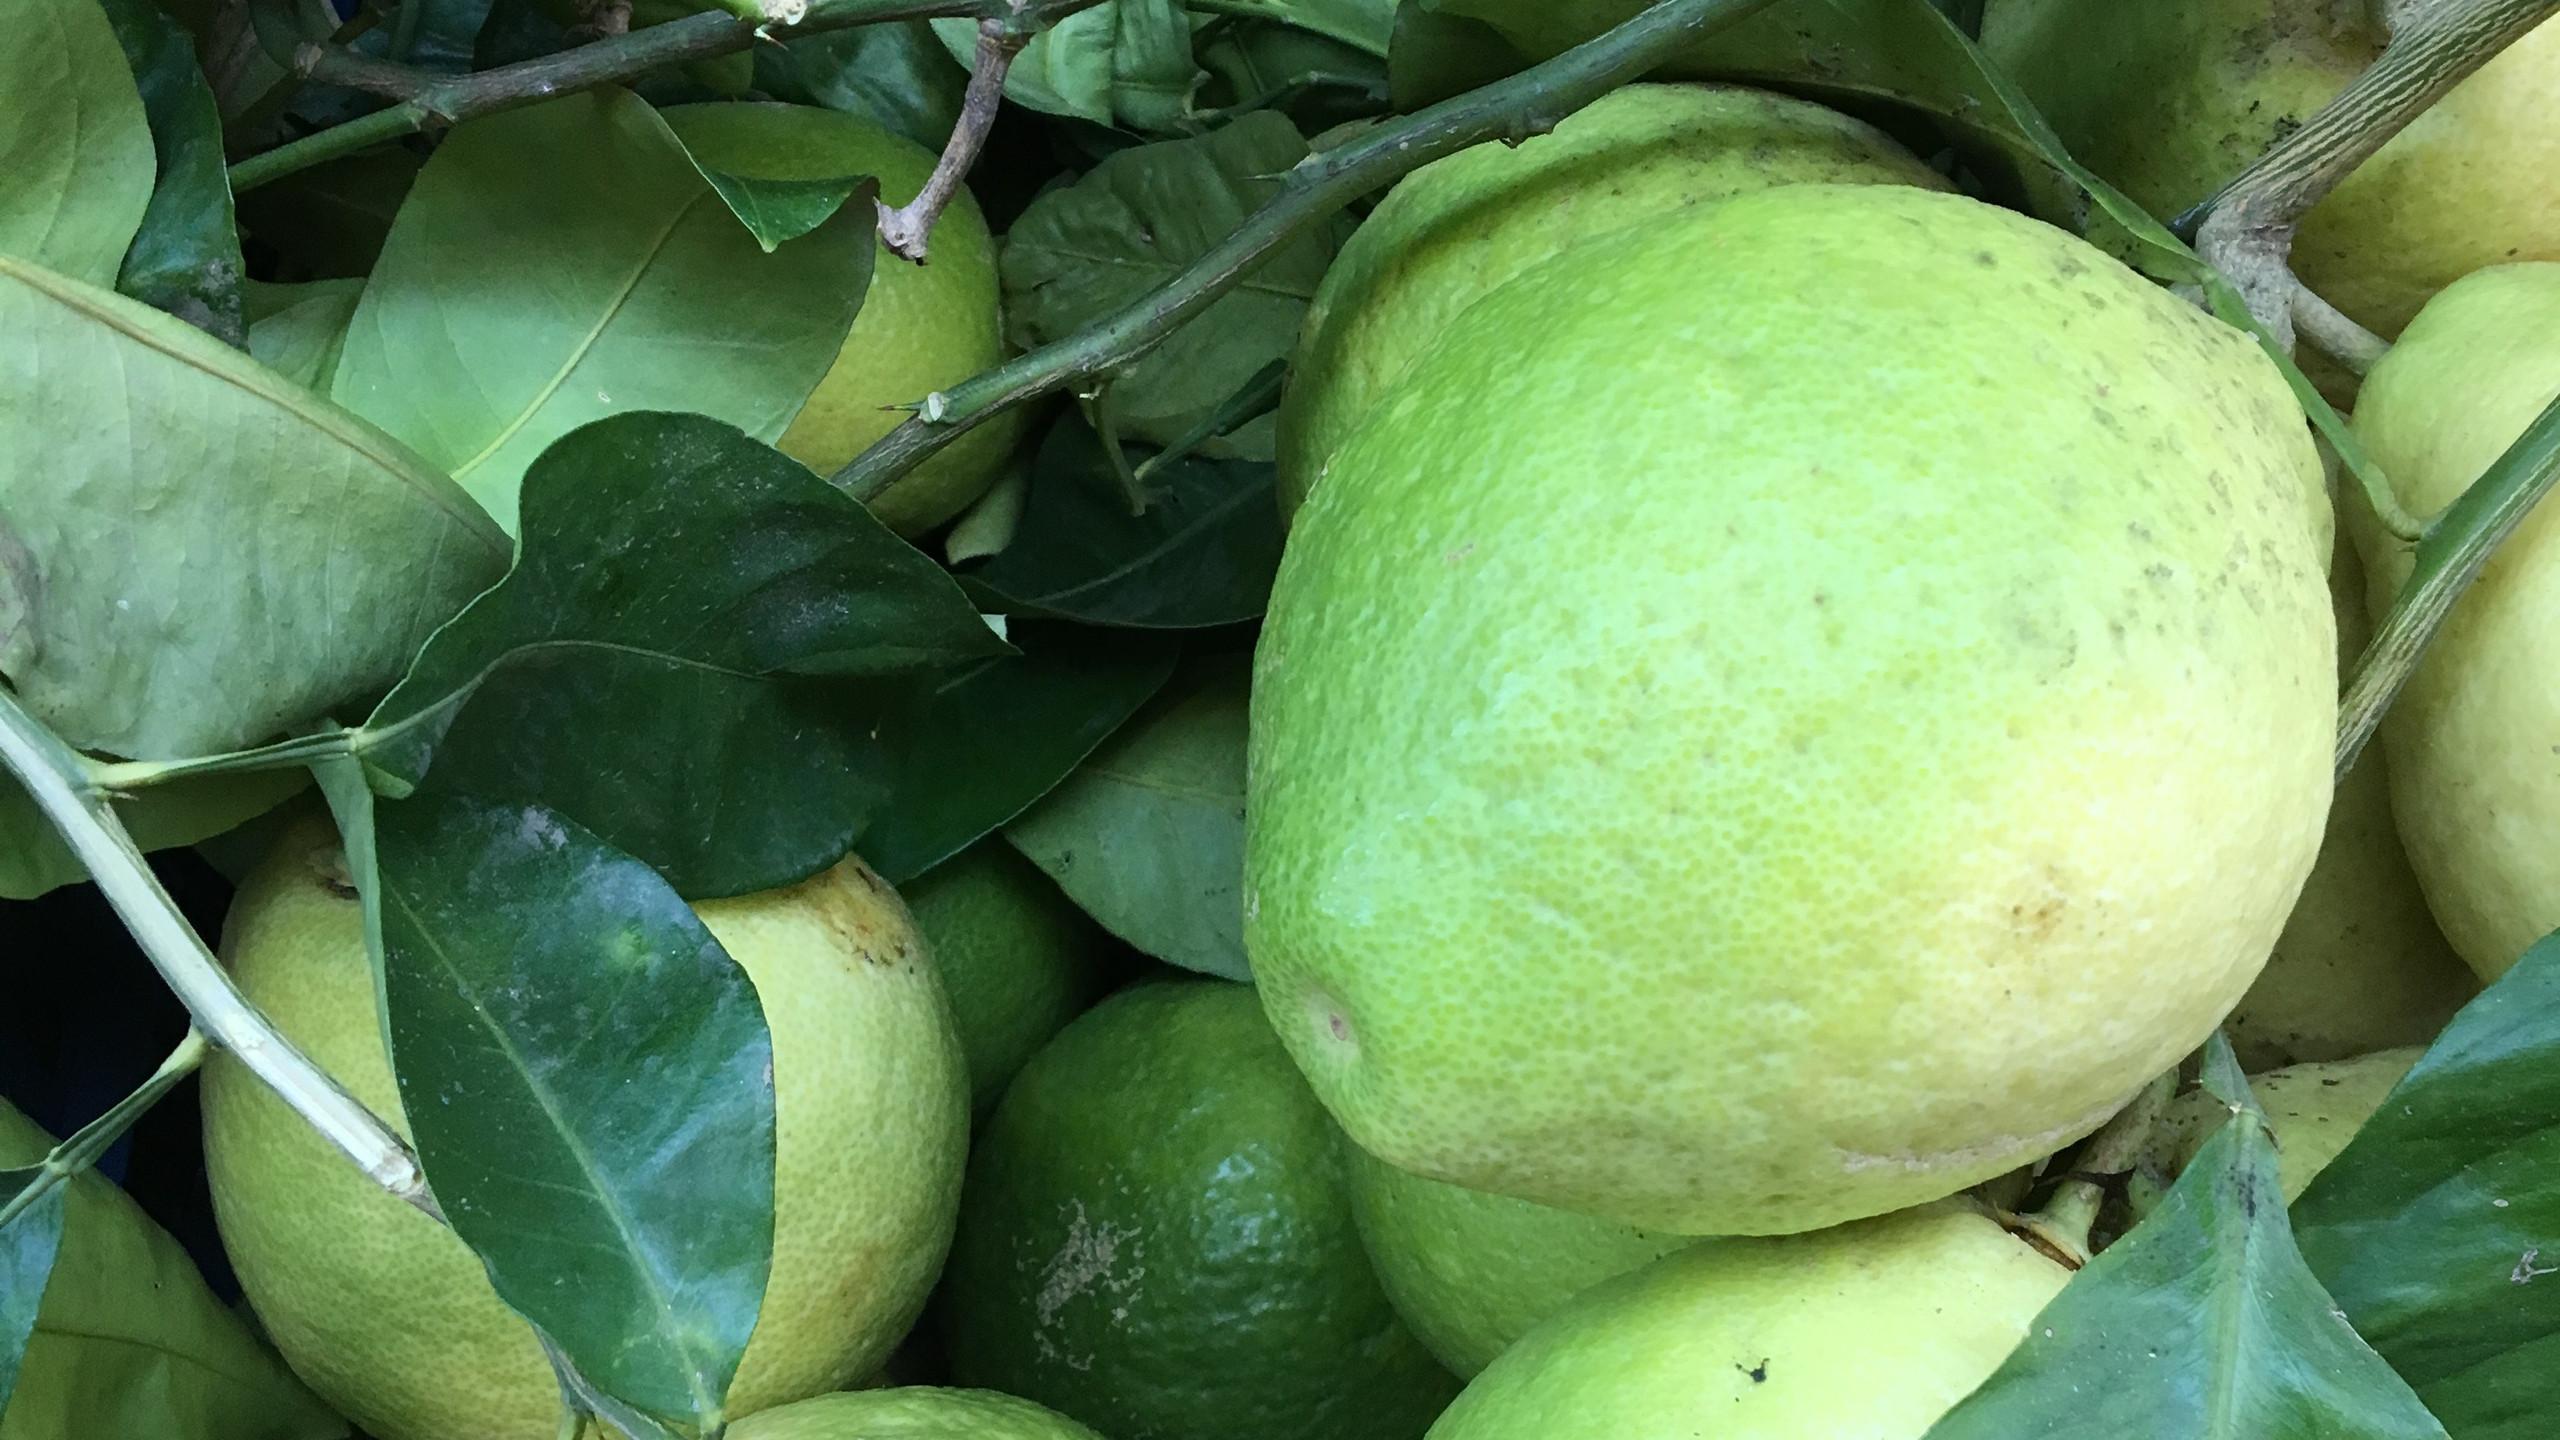 Greenery - Sorrento Lemons